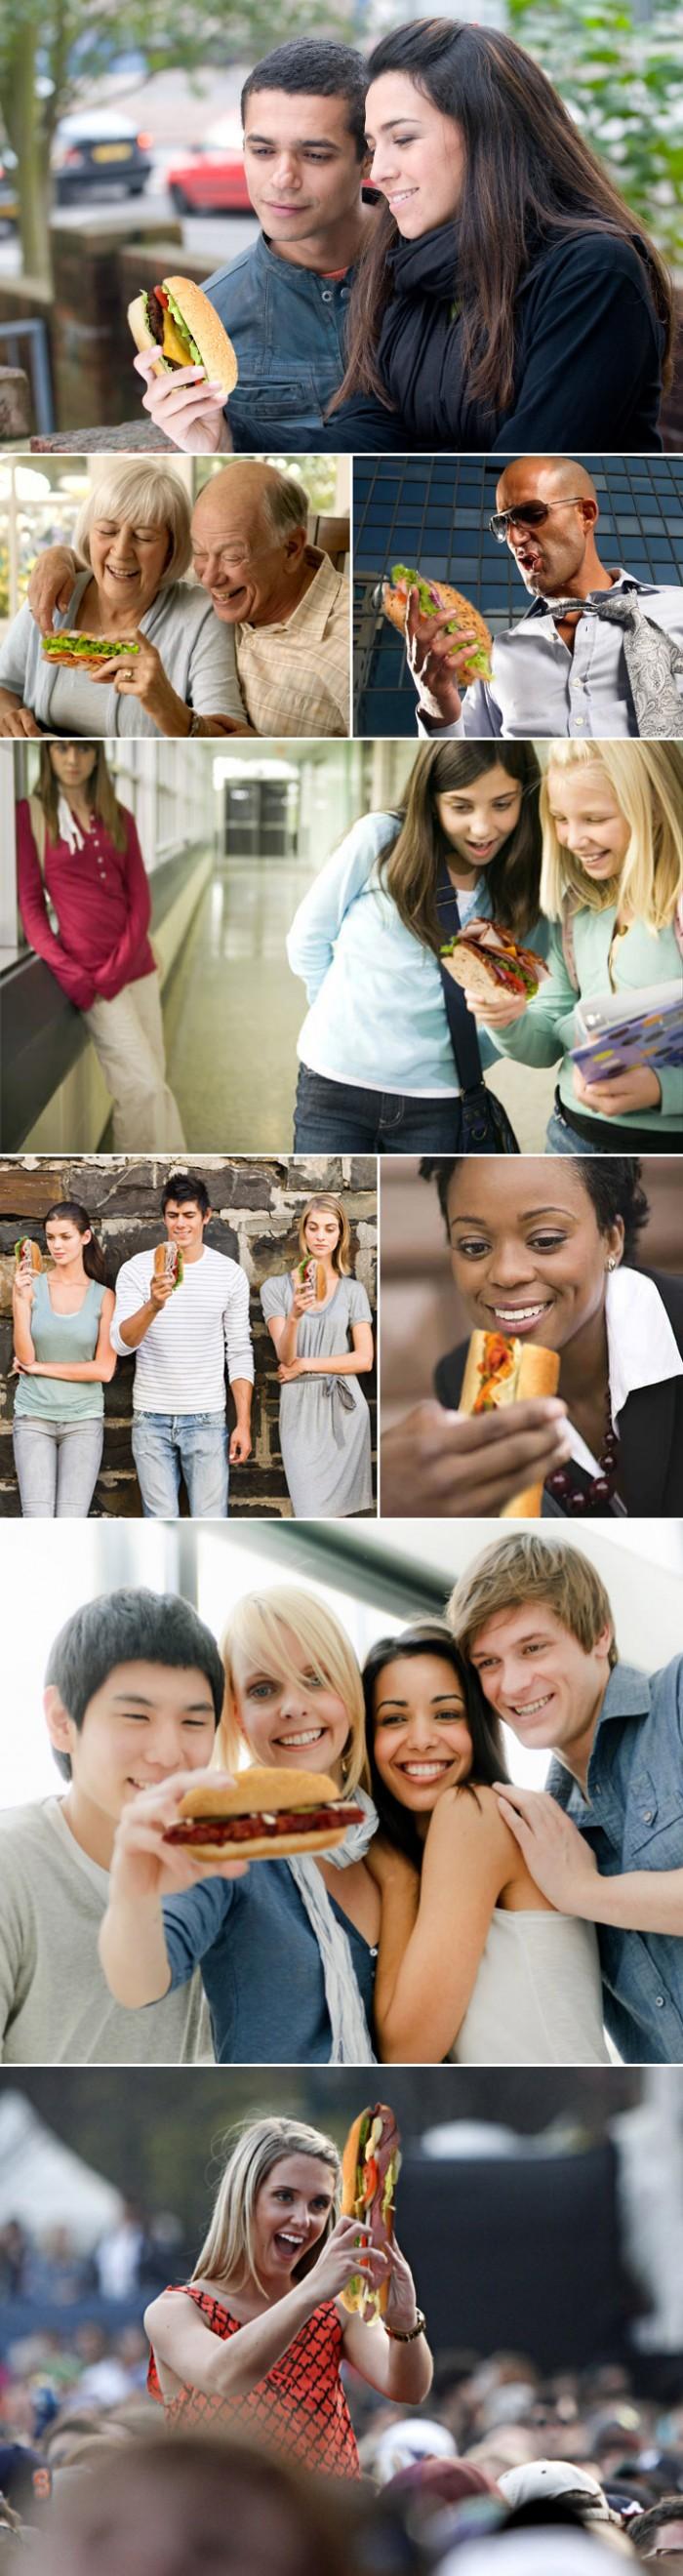 Sandwich phones.jpg